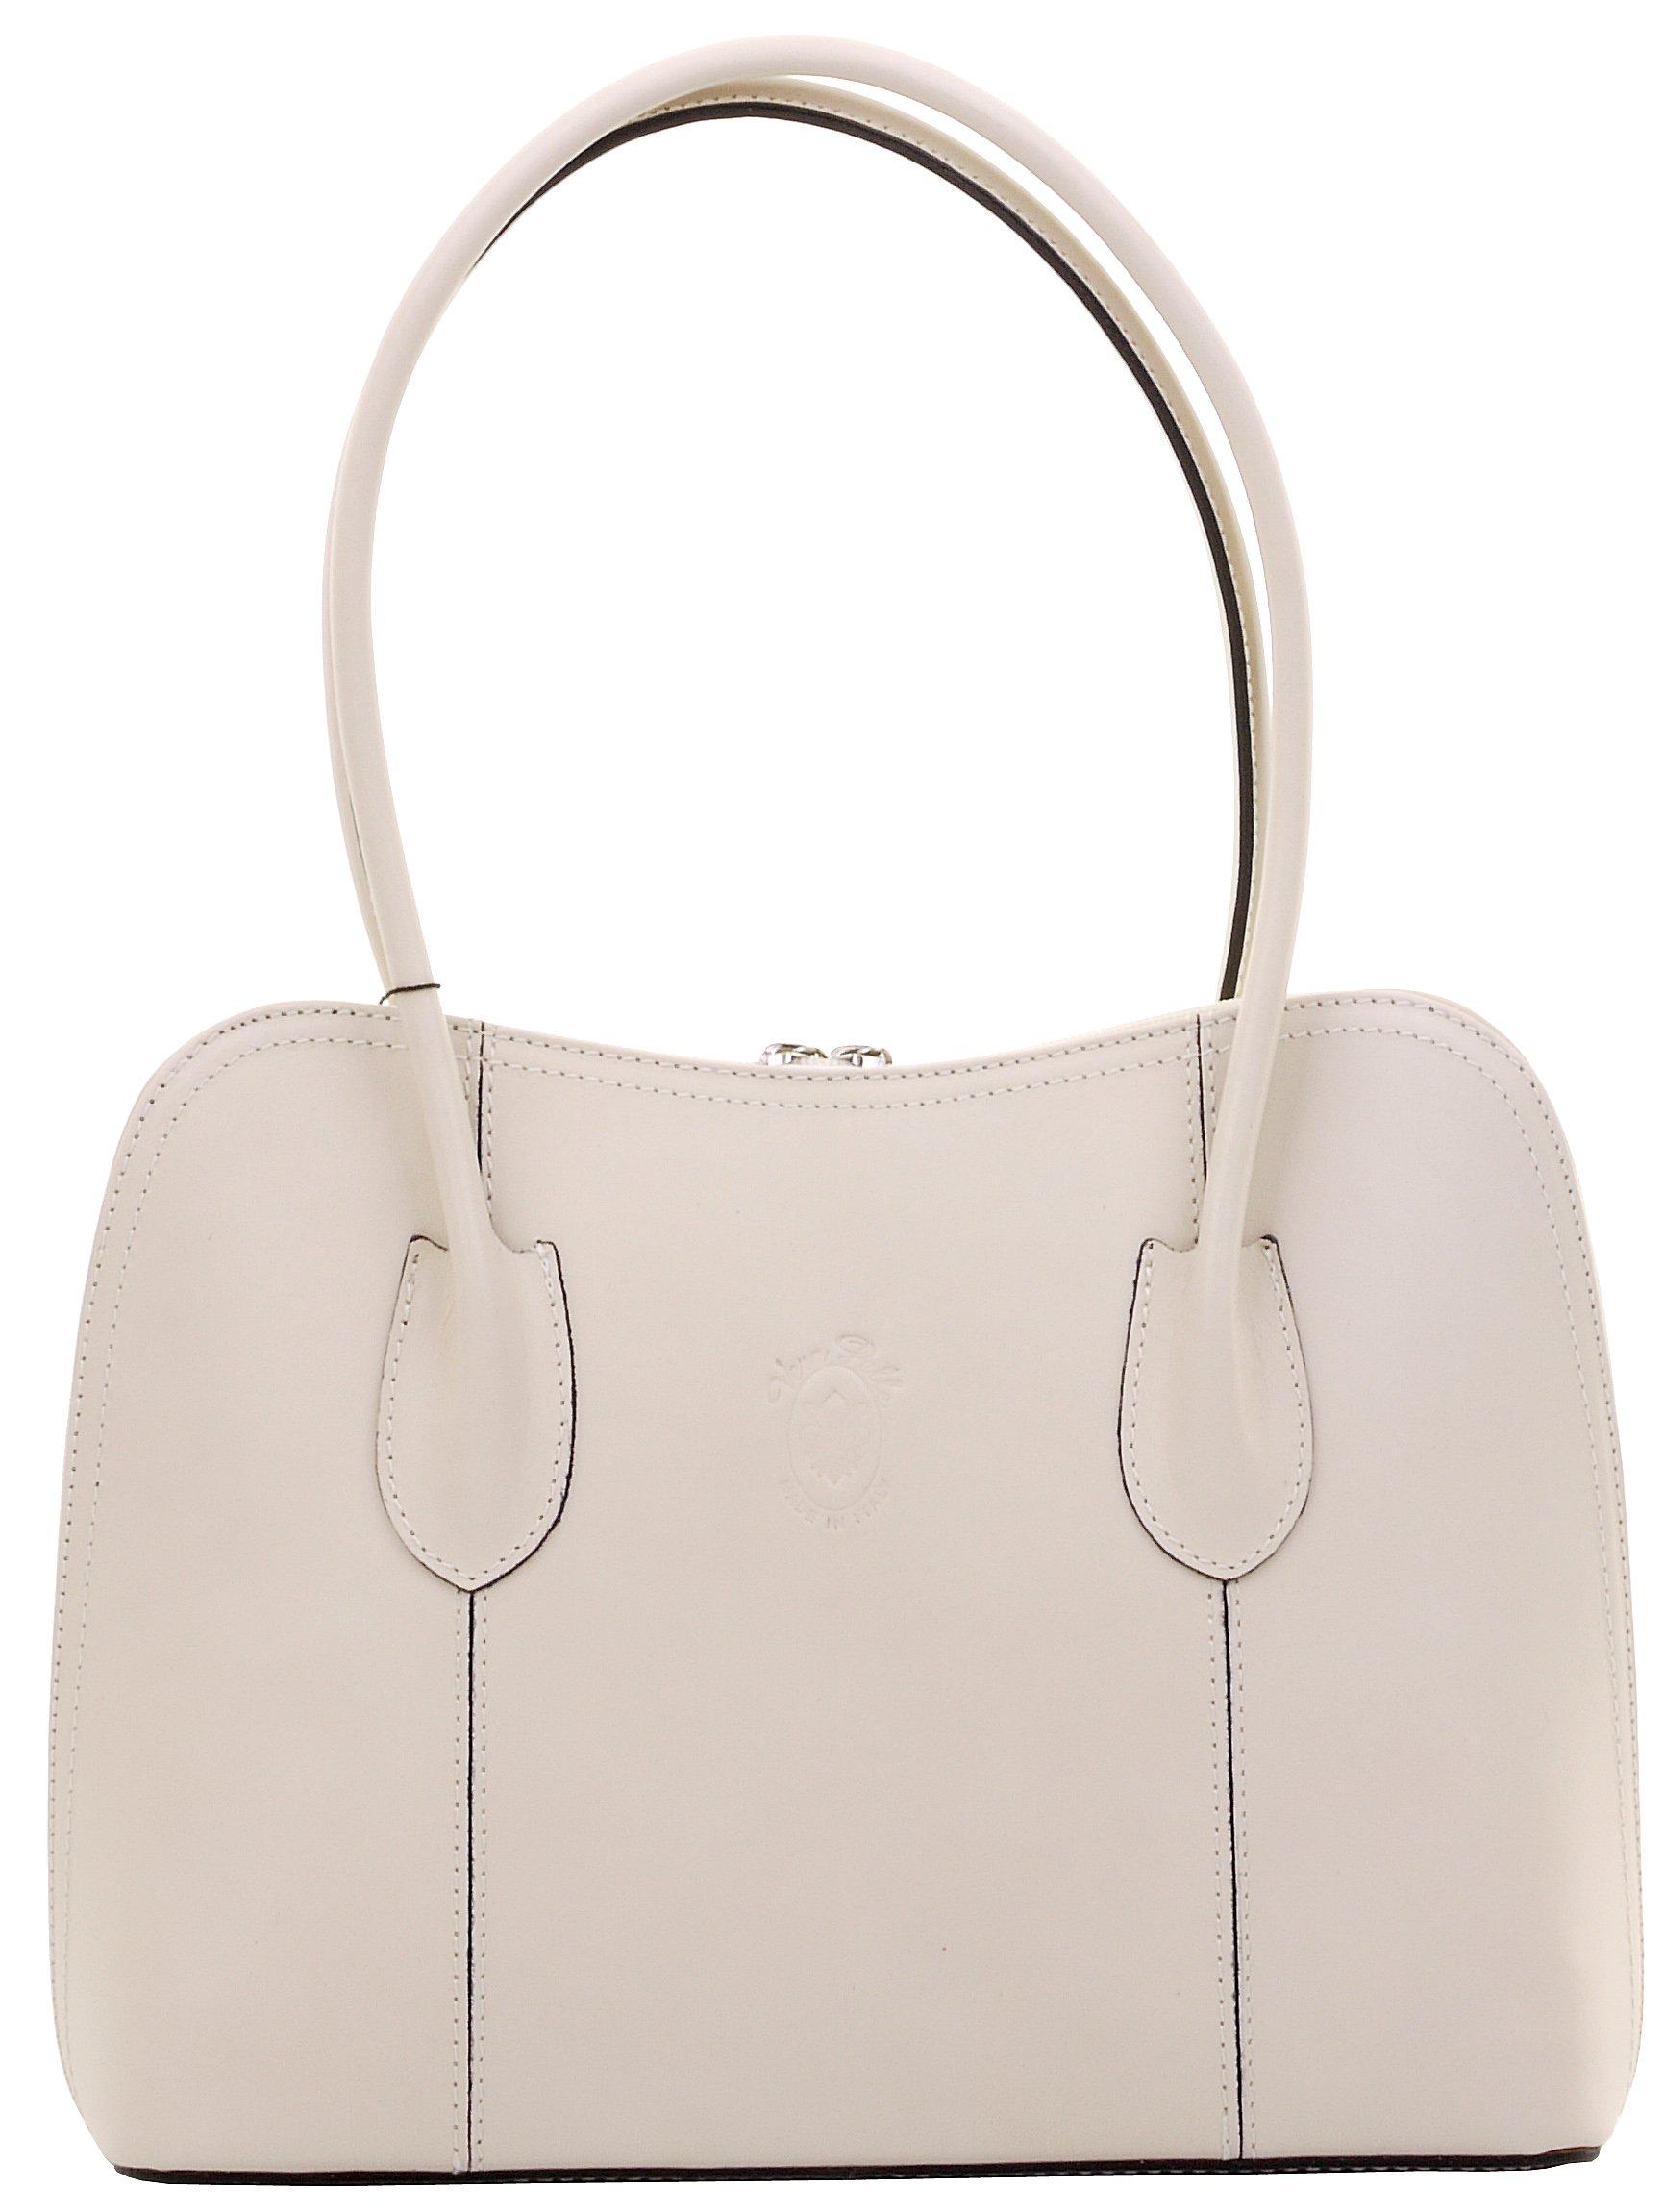 Primo Sacchi Italian Smooth Cream Leather Classic Long Handled Handbag Tote Grab Bag Shoulder Bag